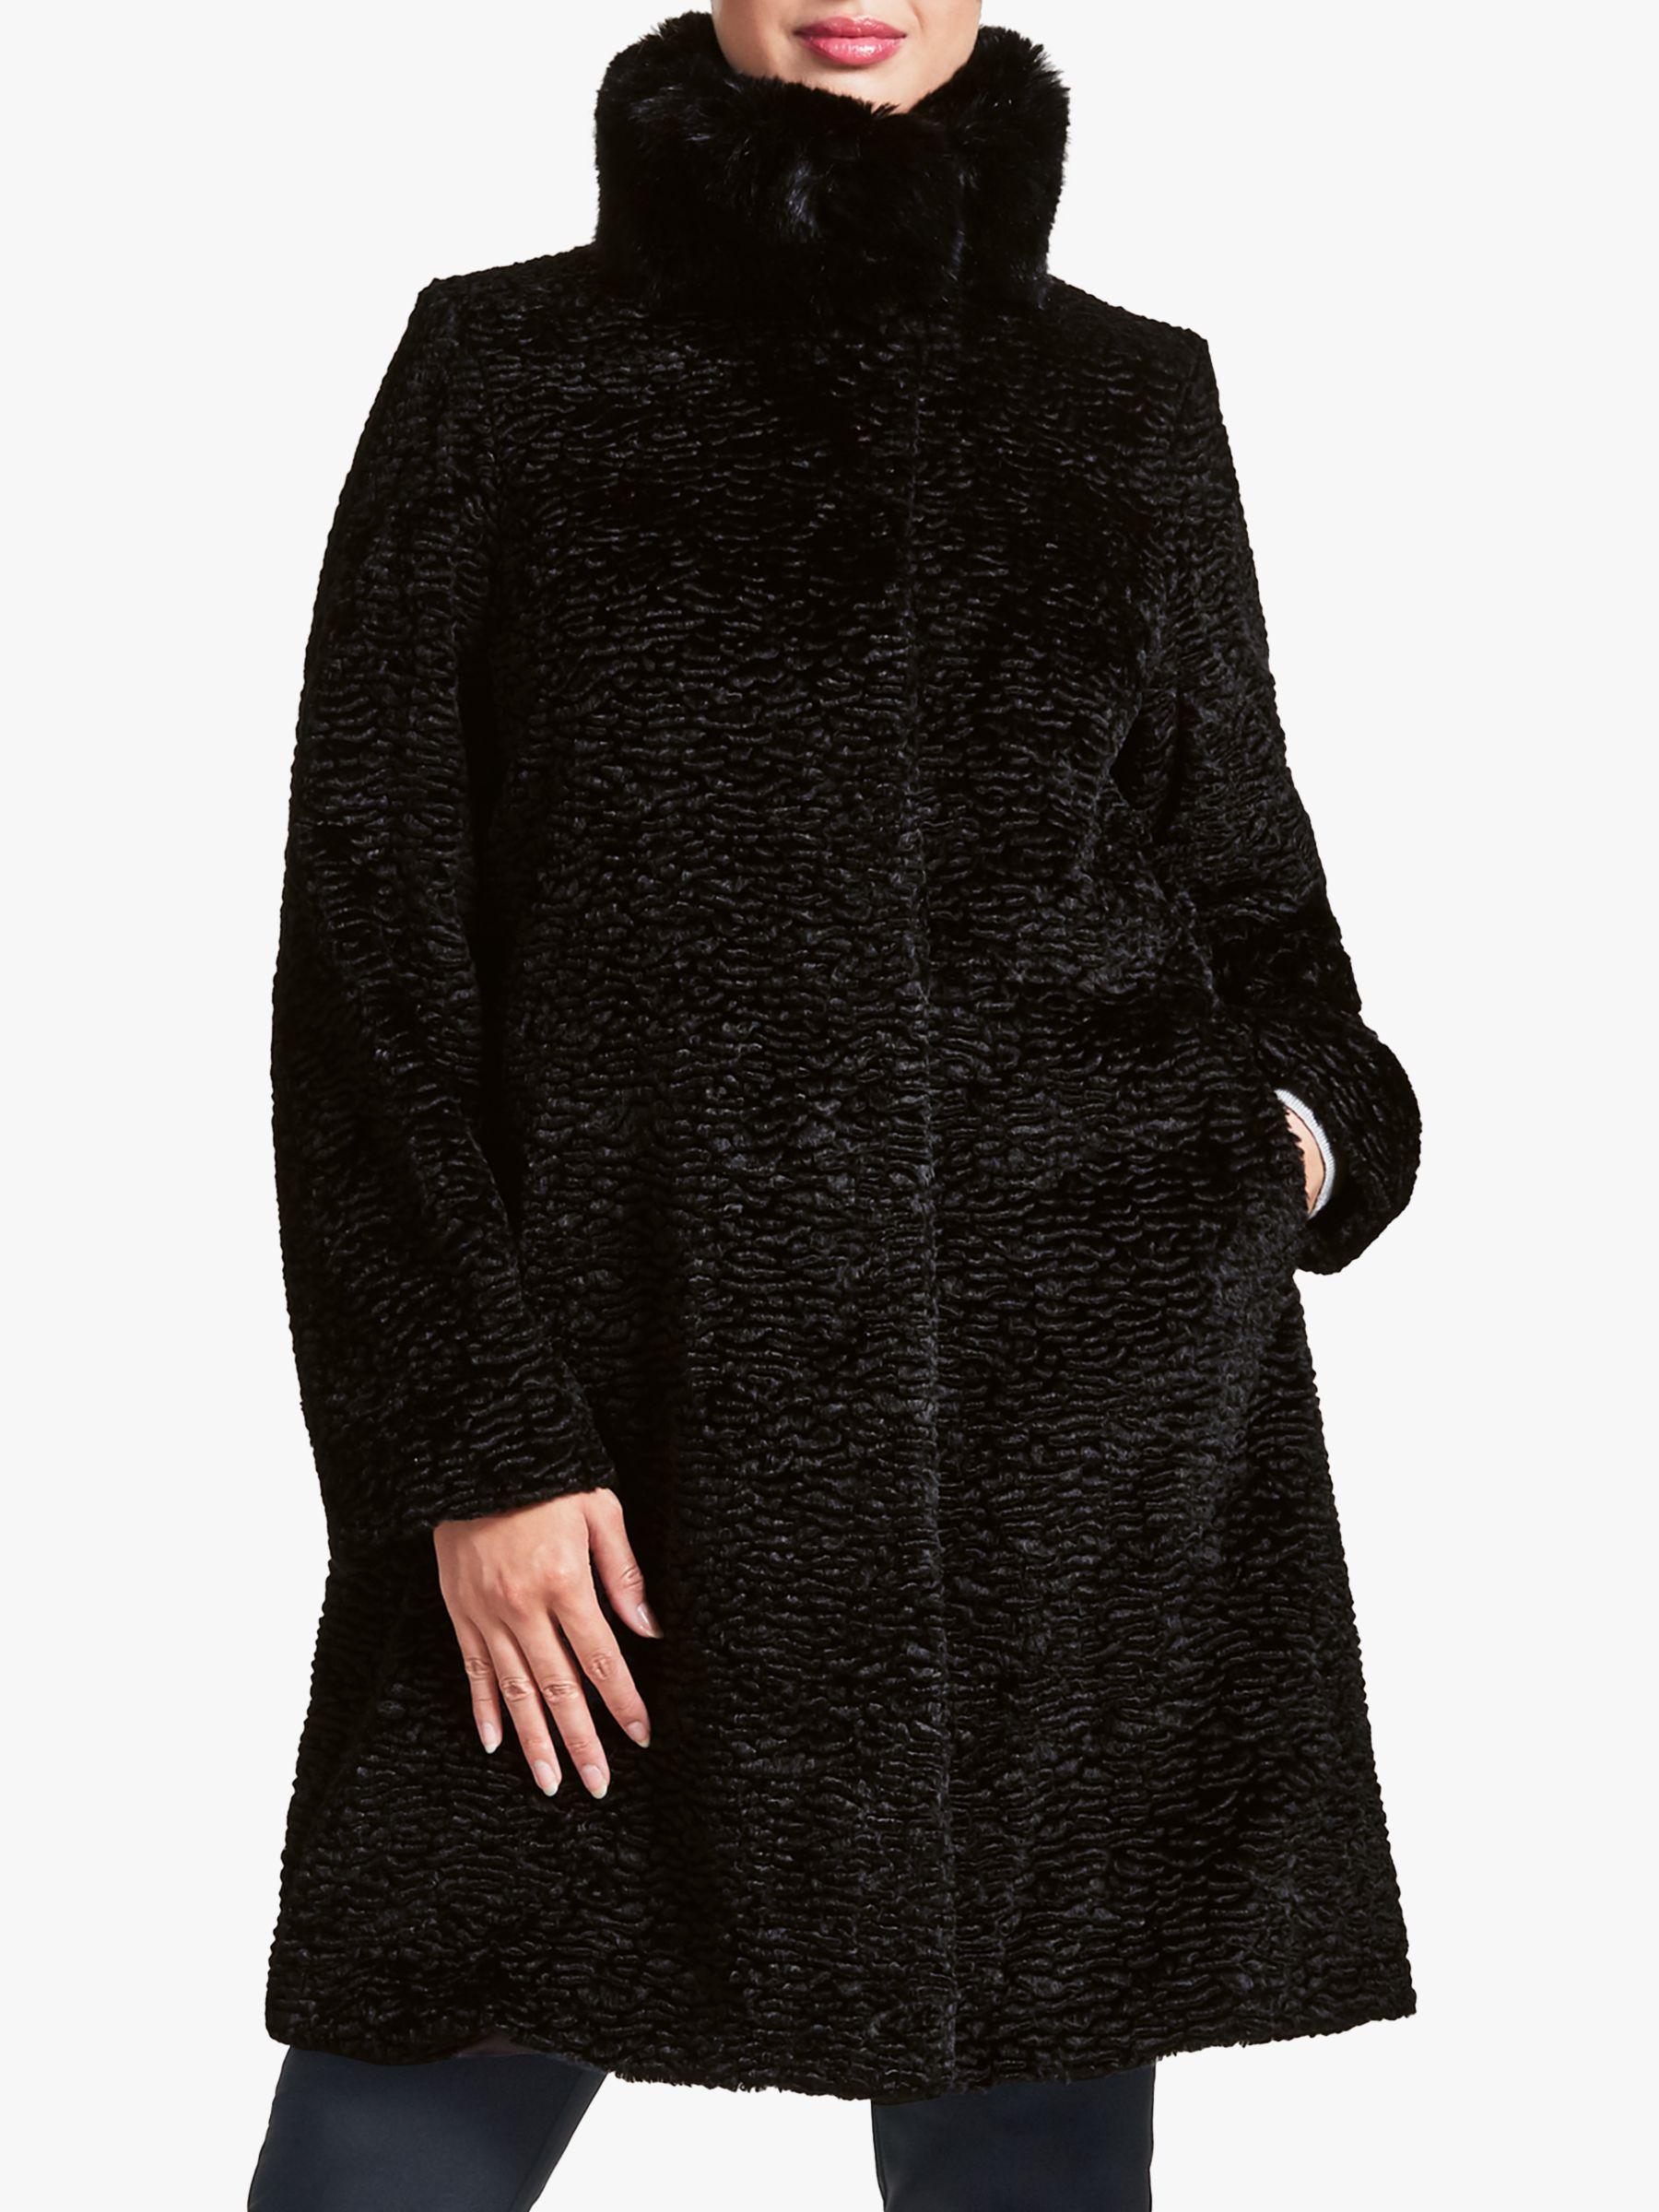 Four Seasons Four Seasons Astrakhan Faux Fur Coat